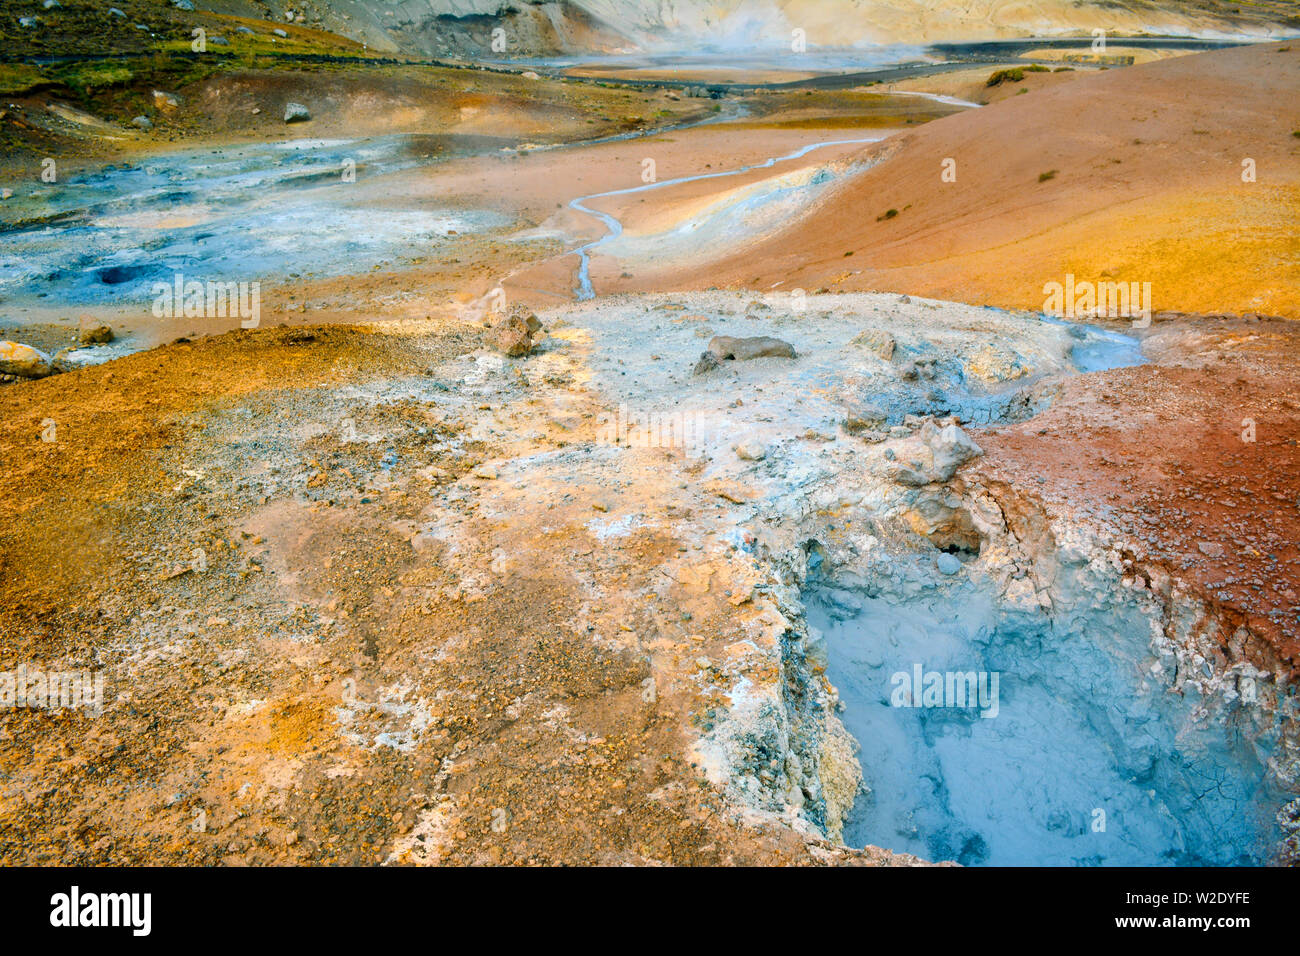 Fumarole field in Namafjall, Iceland. - Stock Image